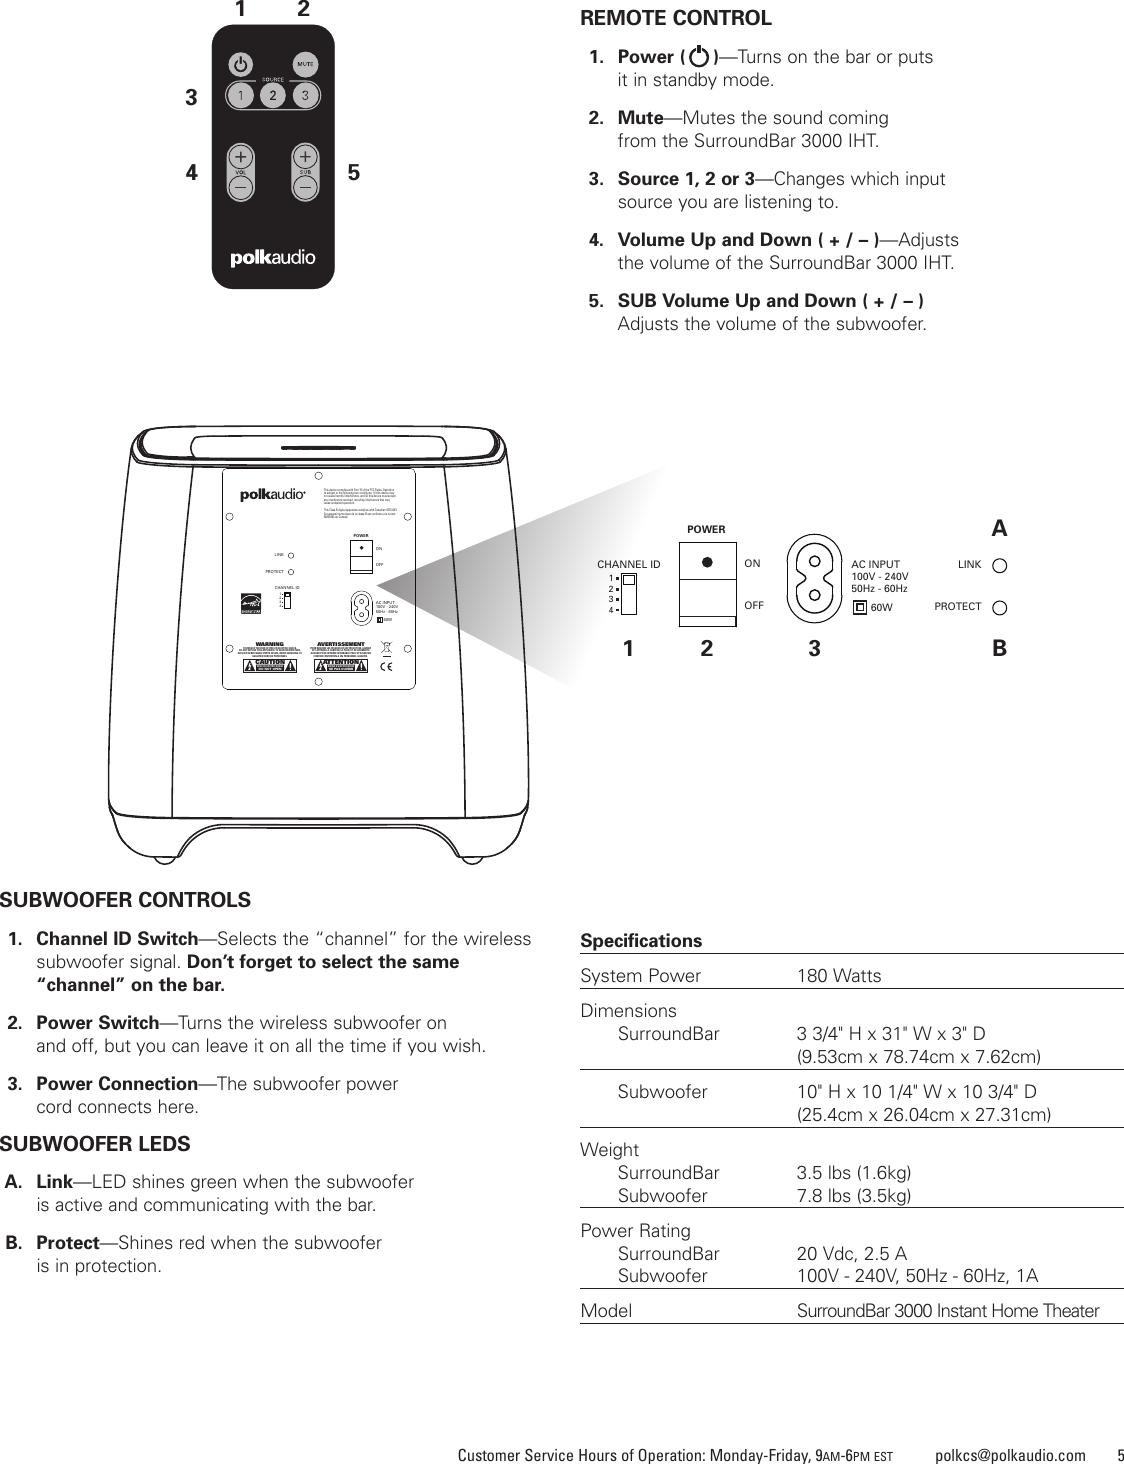 Polk Audio Surroundbar 3000 Users Manual IHT3000_MN_1925Rev on mf 135 wiring diagram, 1970 mustang wiring diagram, farmall 400 wiring diagram, radio wiring diagram, cb microphone wiring diagram, car alarm wiring diagram, ford 8n wiring diagram, farmall a wiring diagram, fuel pump relay wiring diagram,